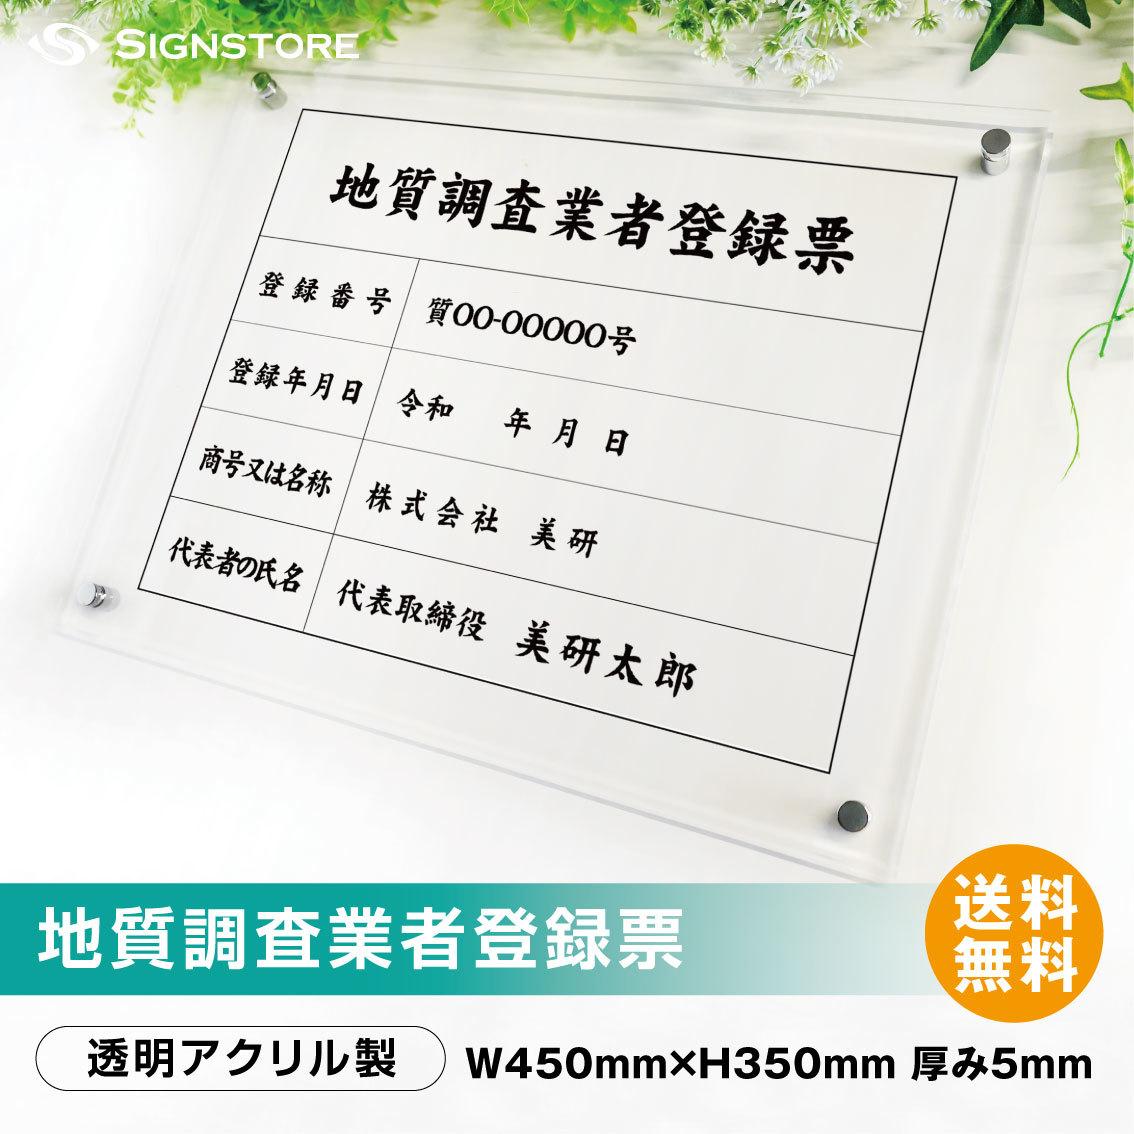 W450×H350mm 格安 価格でご提供いたします 厚み5mm※透明アクリル※アクリル四辺R面取り加工※化粧ビス4個付き 地質調査業者登録票 プレート看板 透明アクリル UV印刷 厚み5mm 店内全品対象 内容印刷込